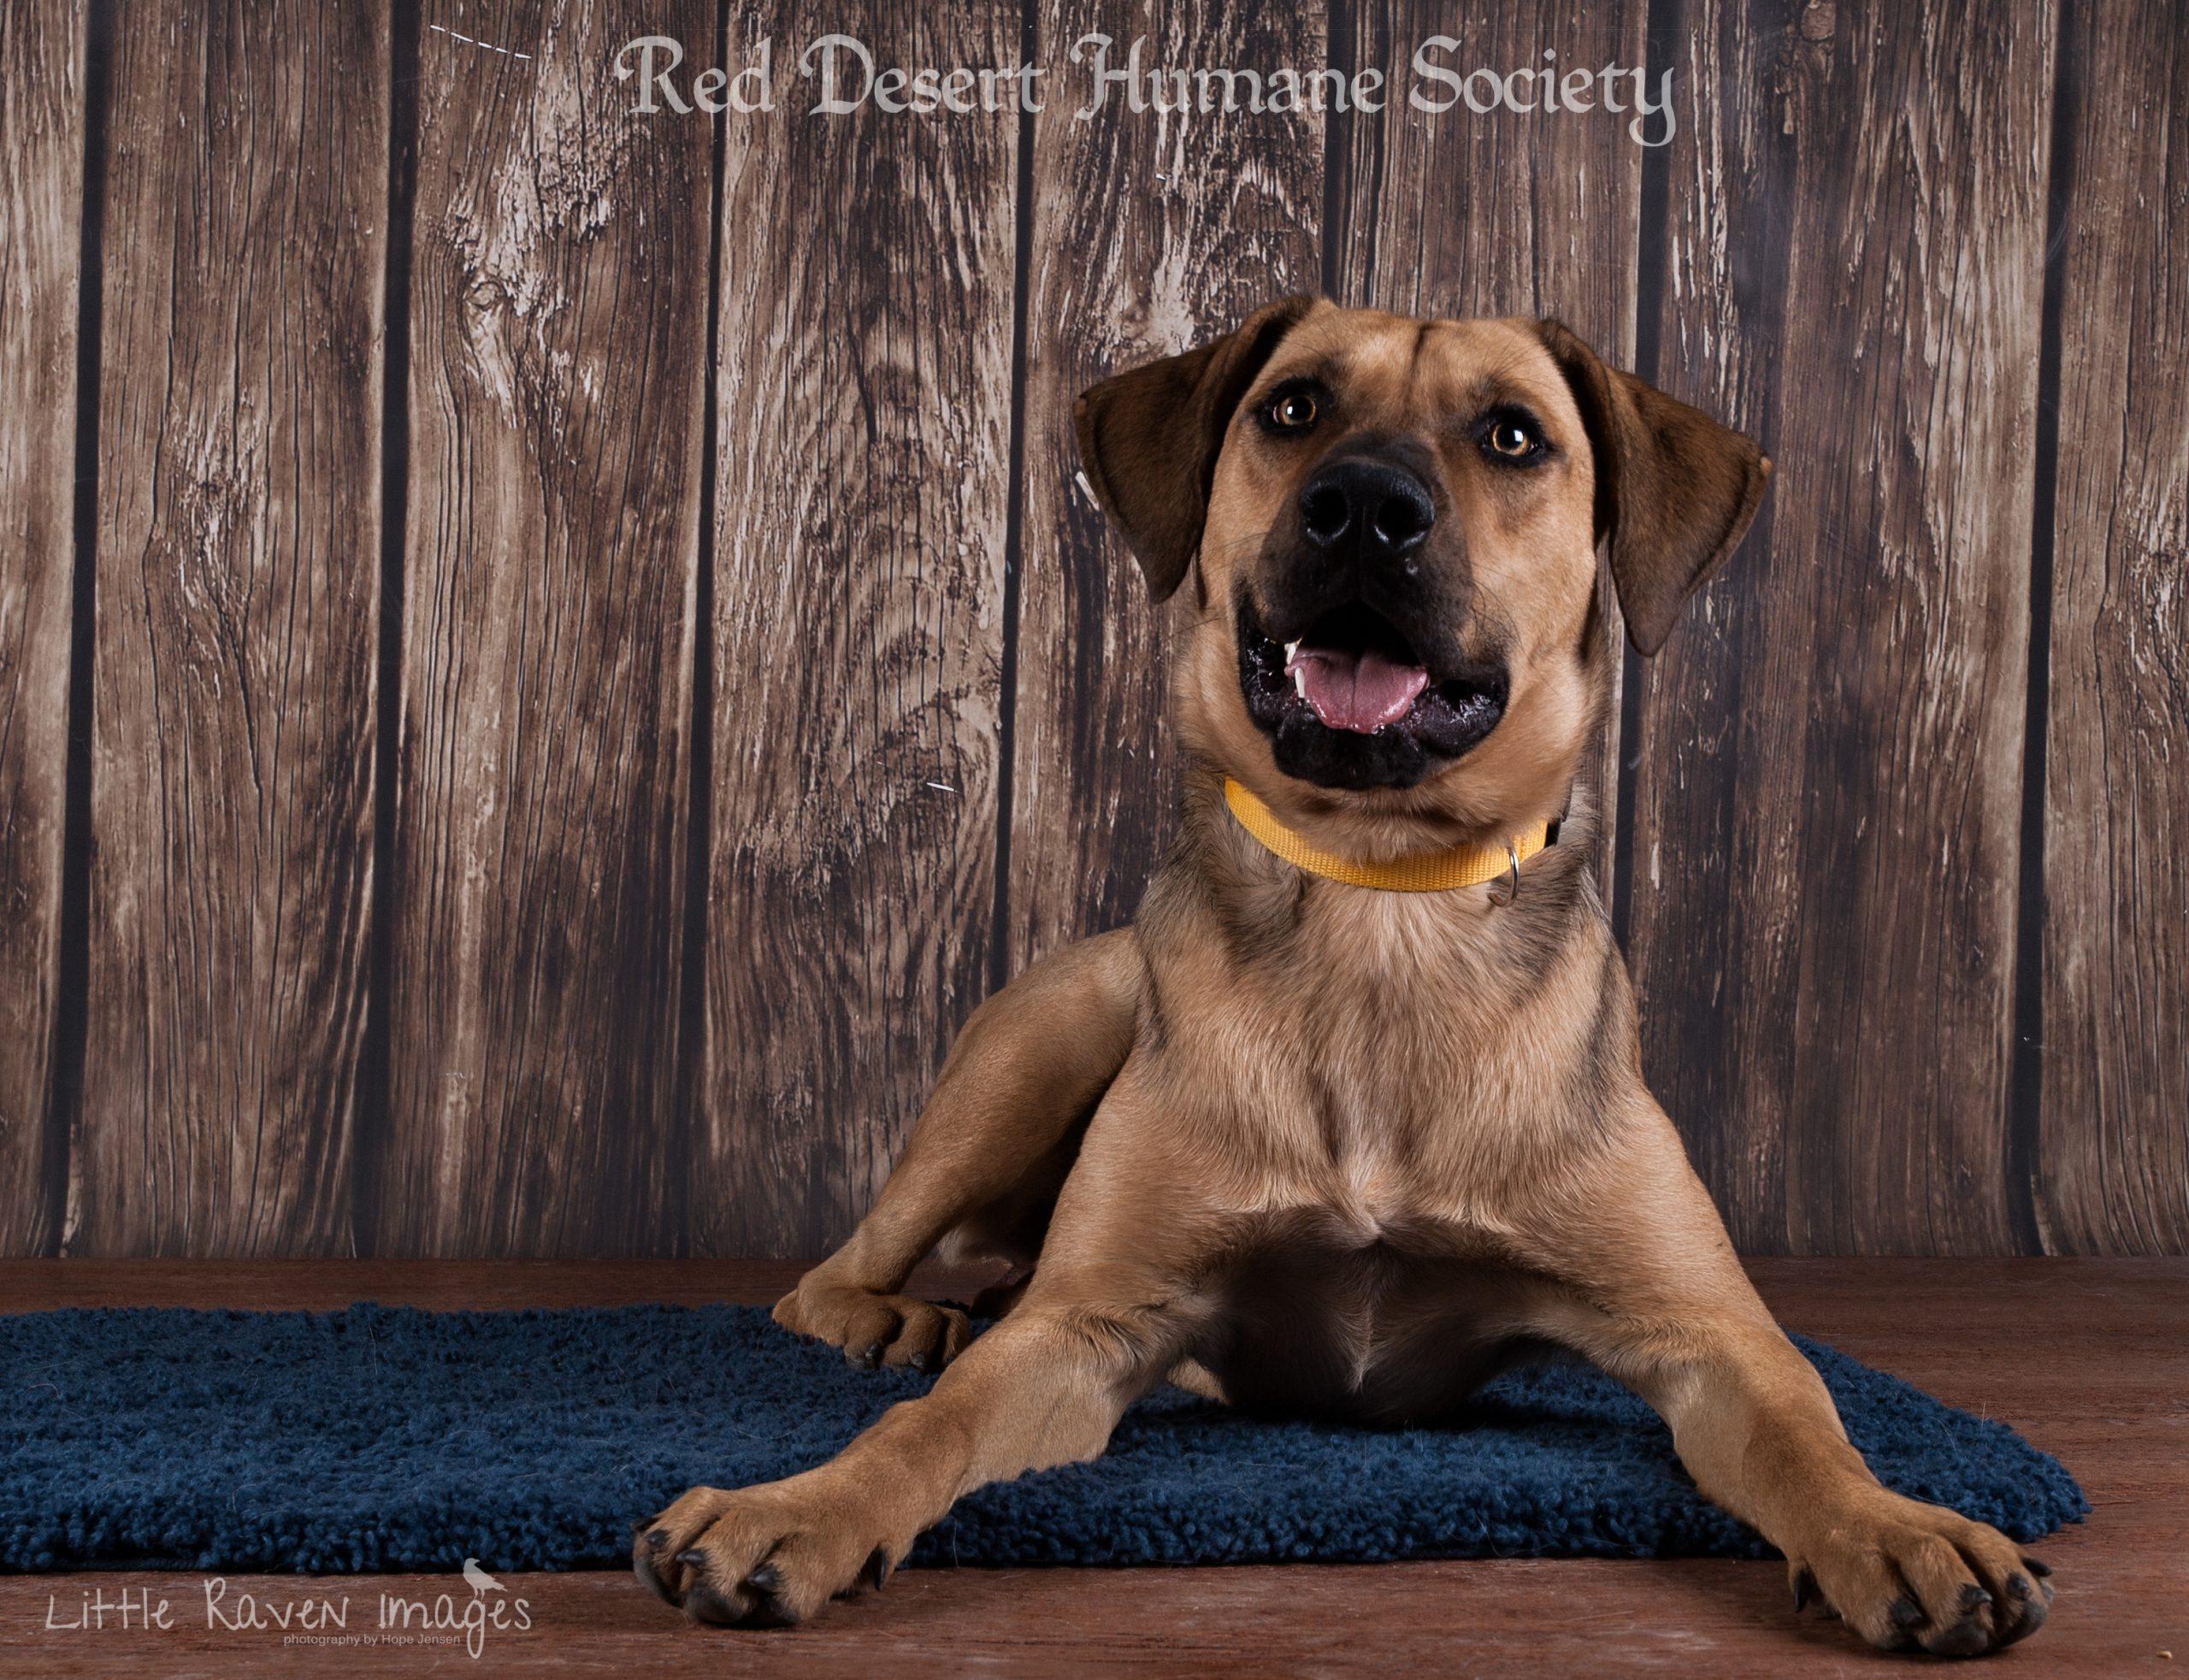 Rome, Smith and Wesson: Pet adoption spotlight